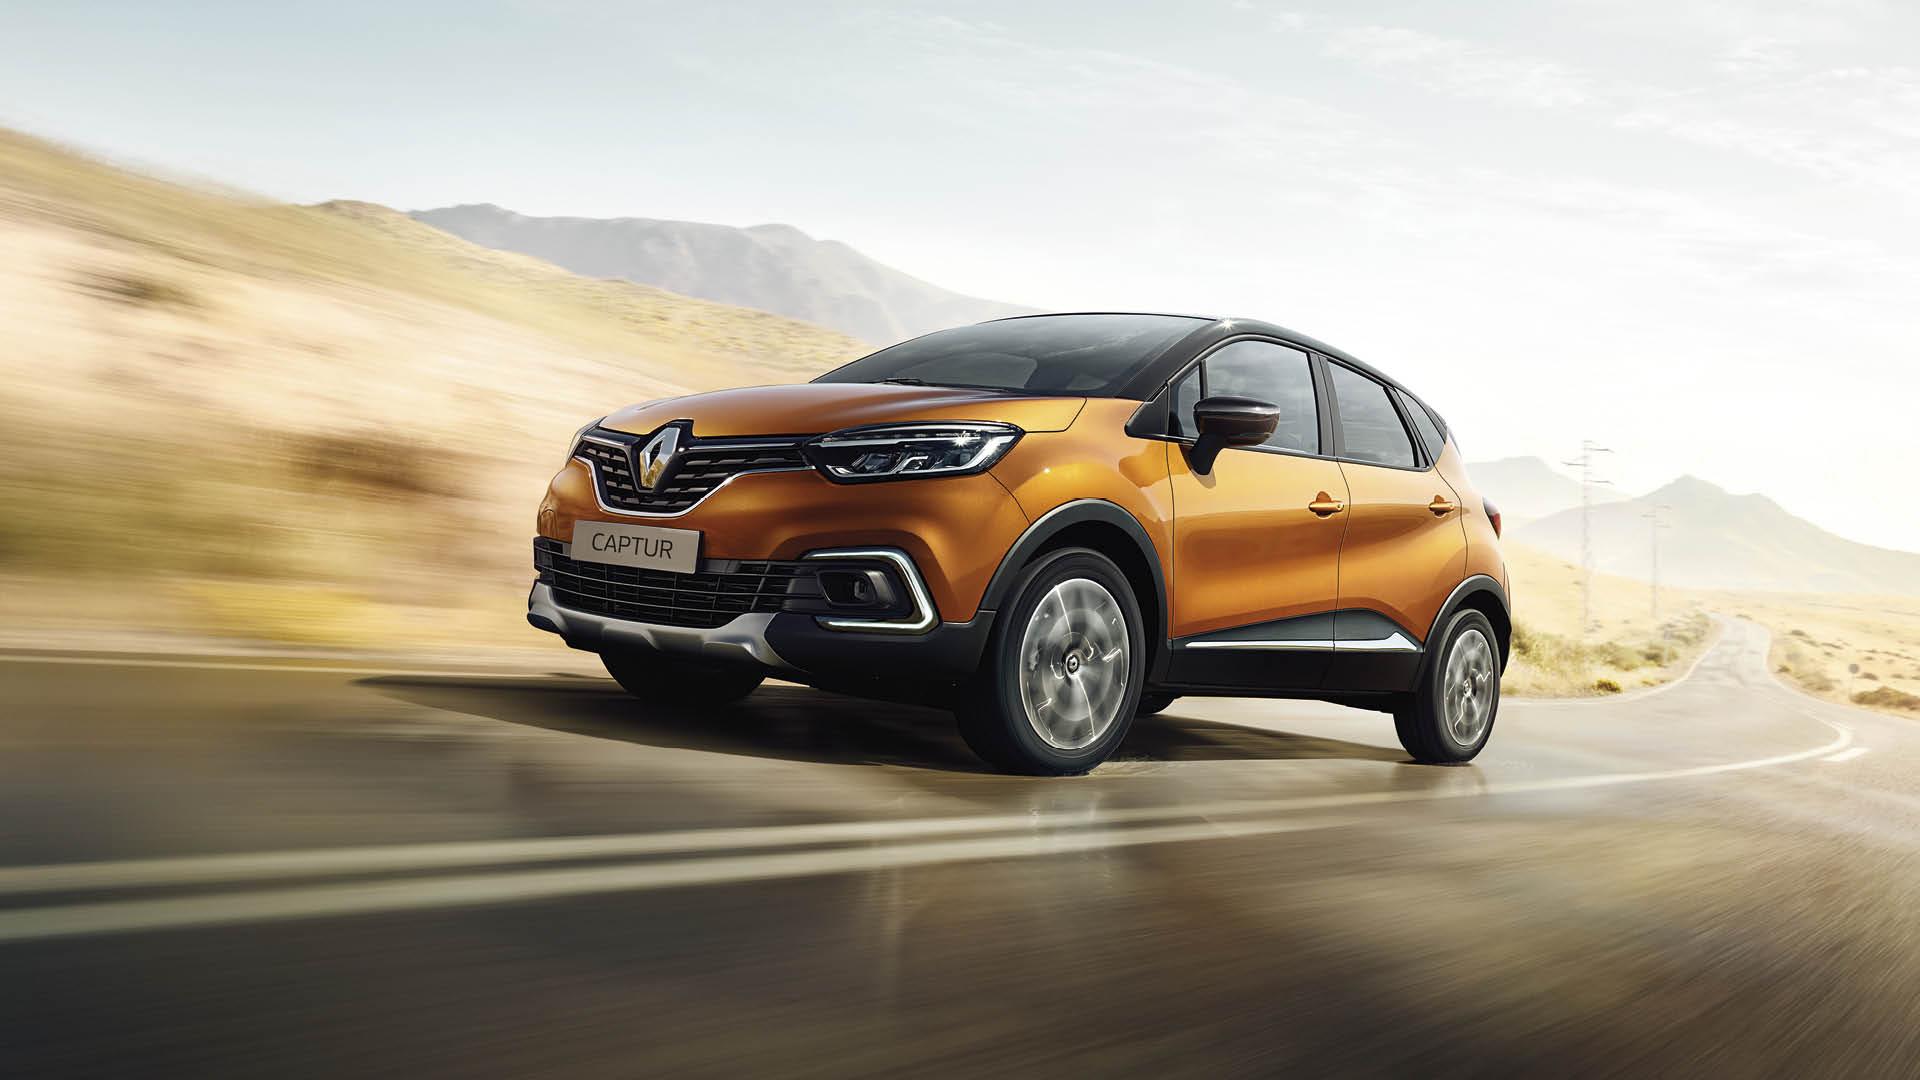 New Captur Even More Distinctive Donnelly Renault